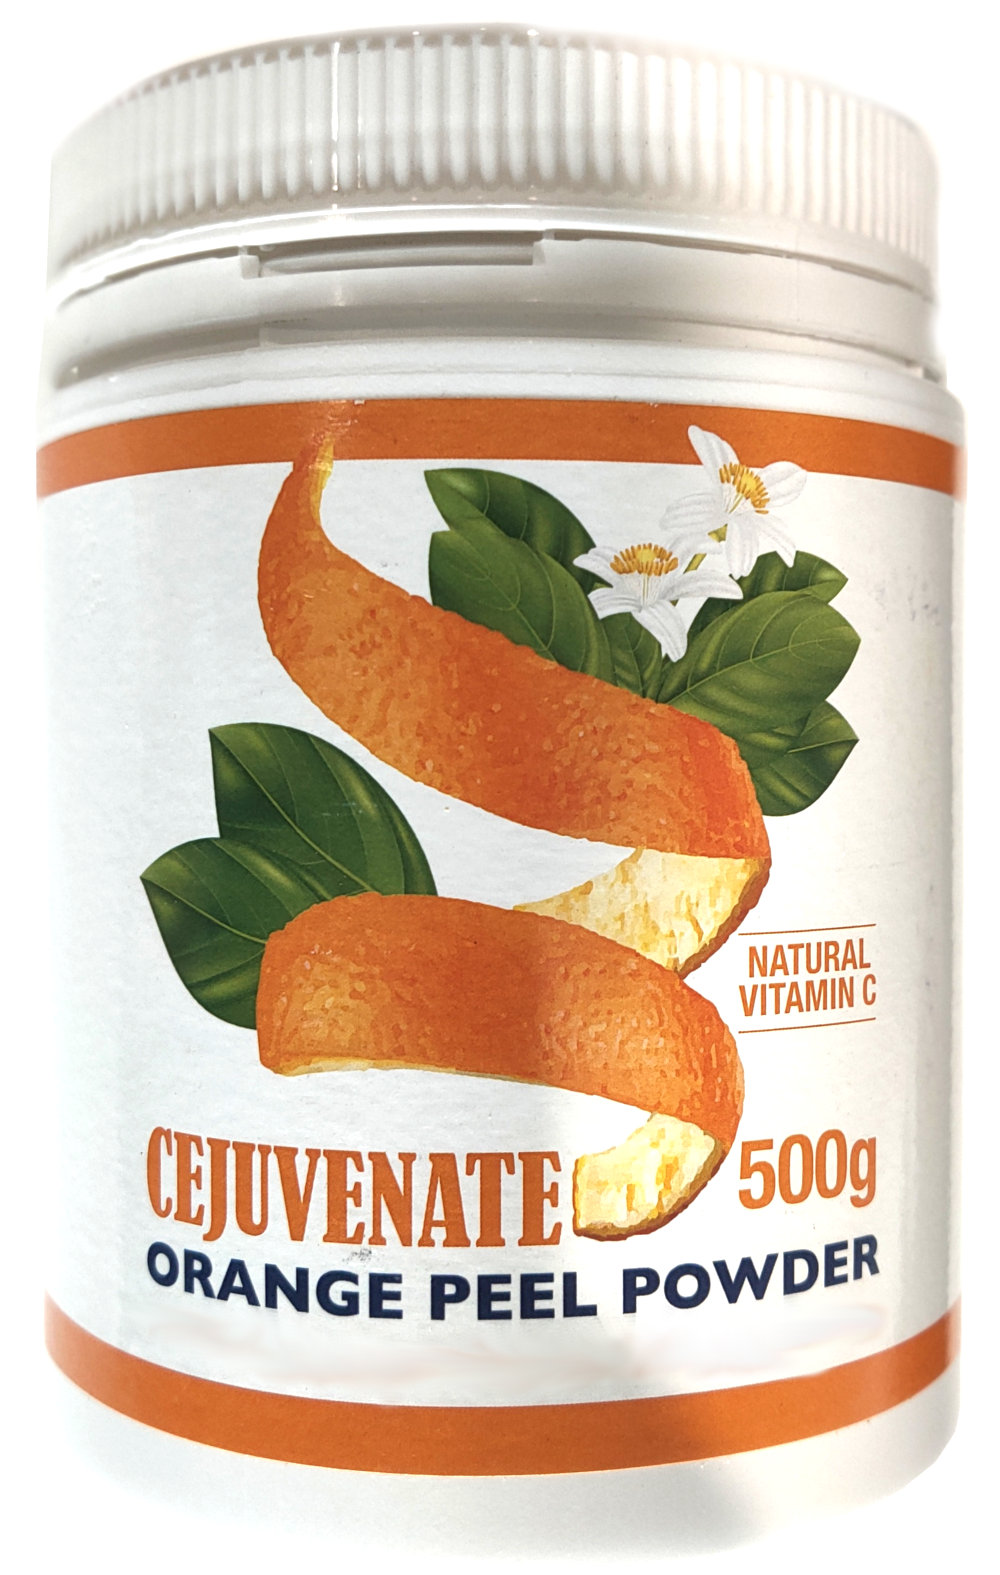 Cejuvenate Natural Vitamin C BioFlavanoids | Orange Peel Powder